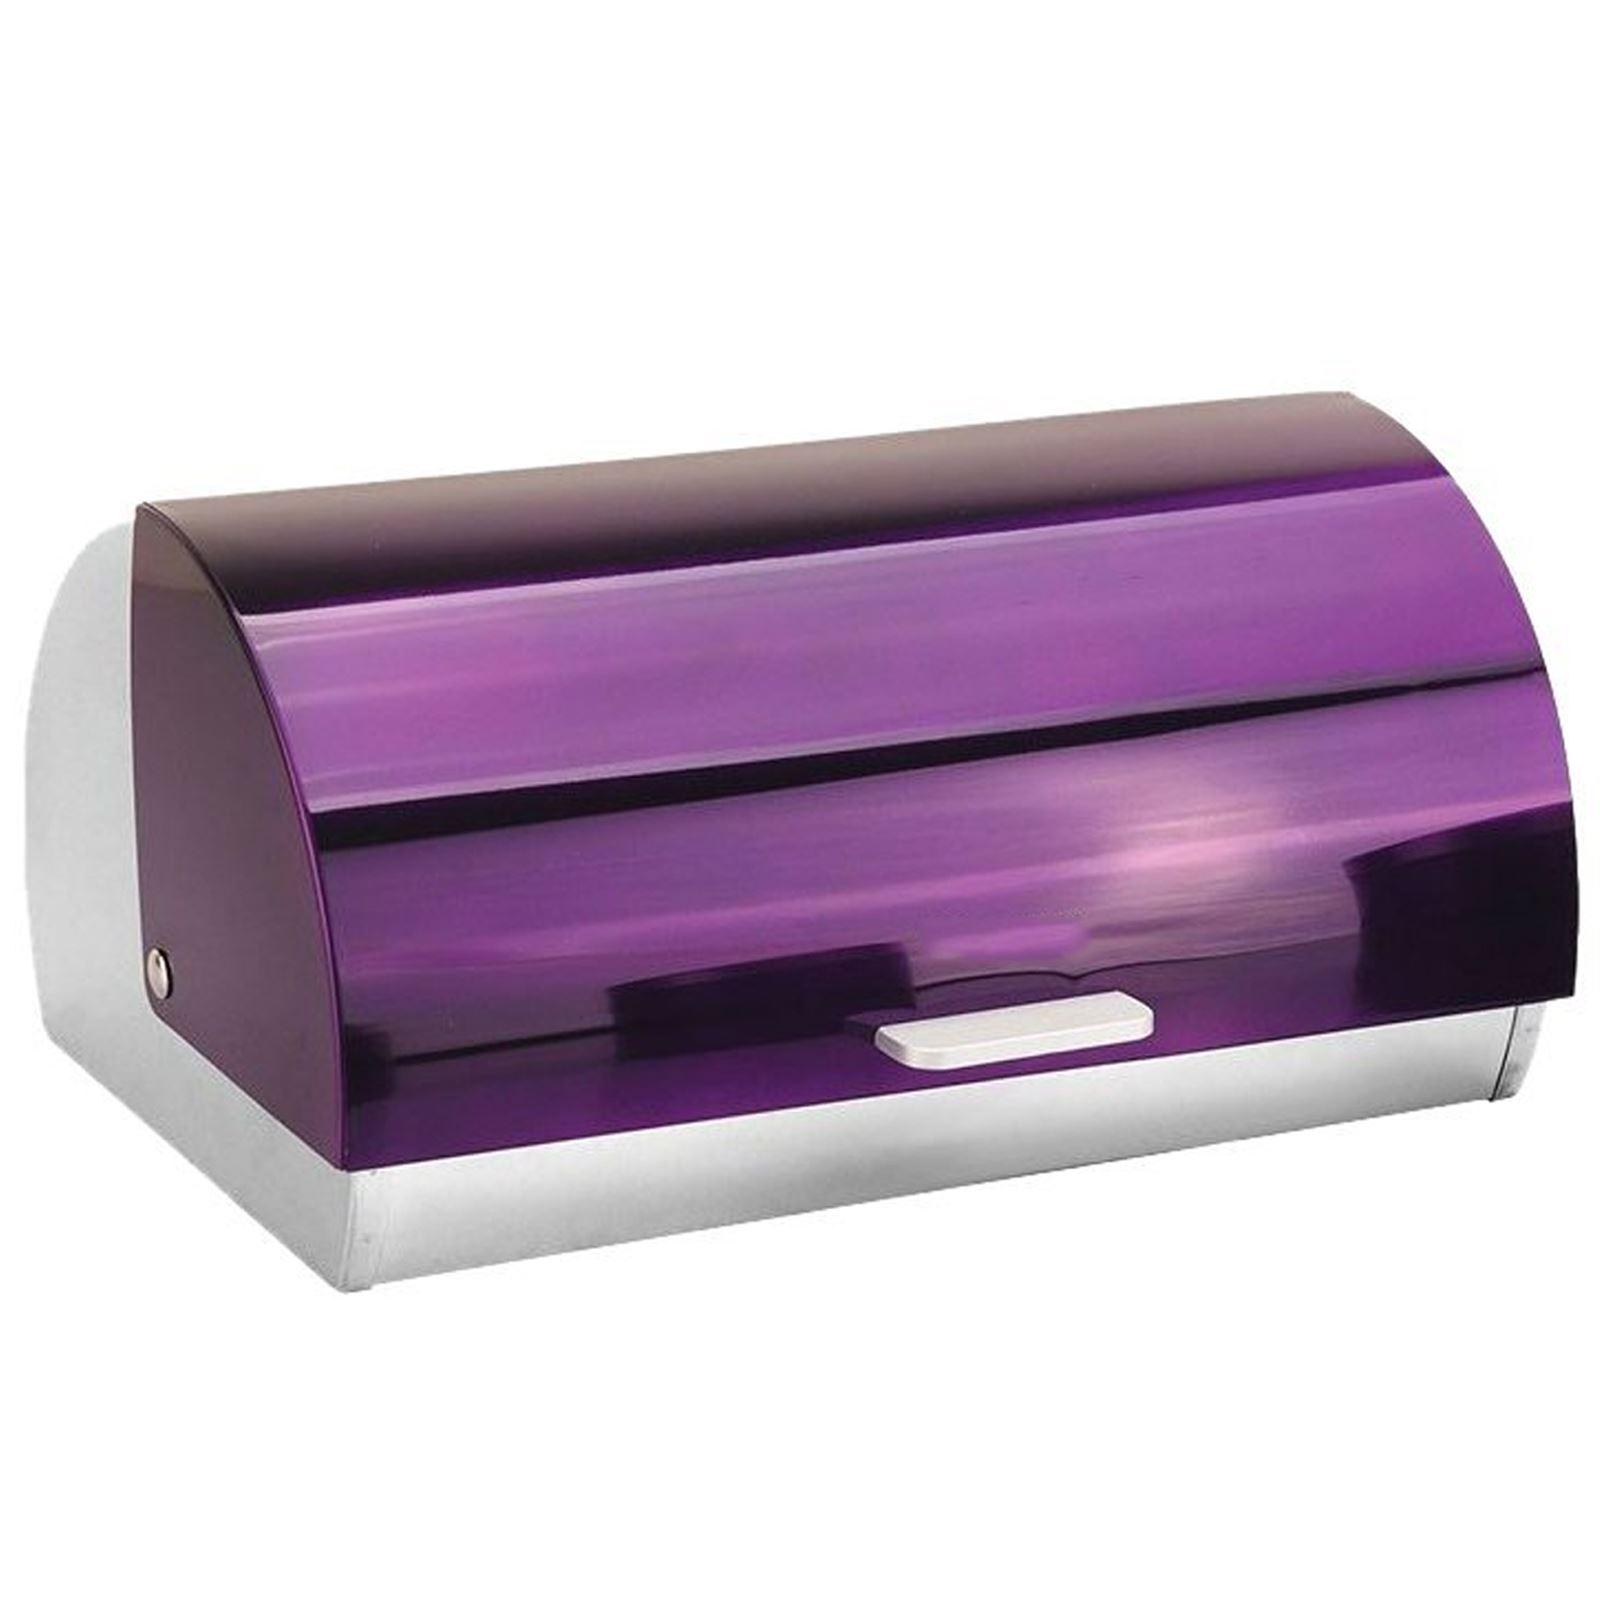 Metallic-Roll-Top-Bread-Bin-Tea-Coffee-Sugar-Jar-Canister-Sets-Kitchen-Storage thumbnail 17